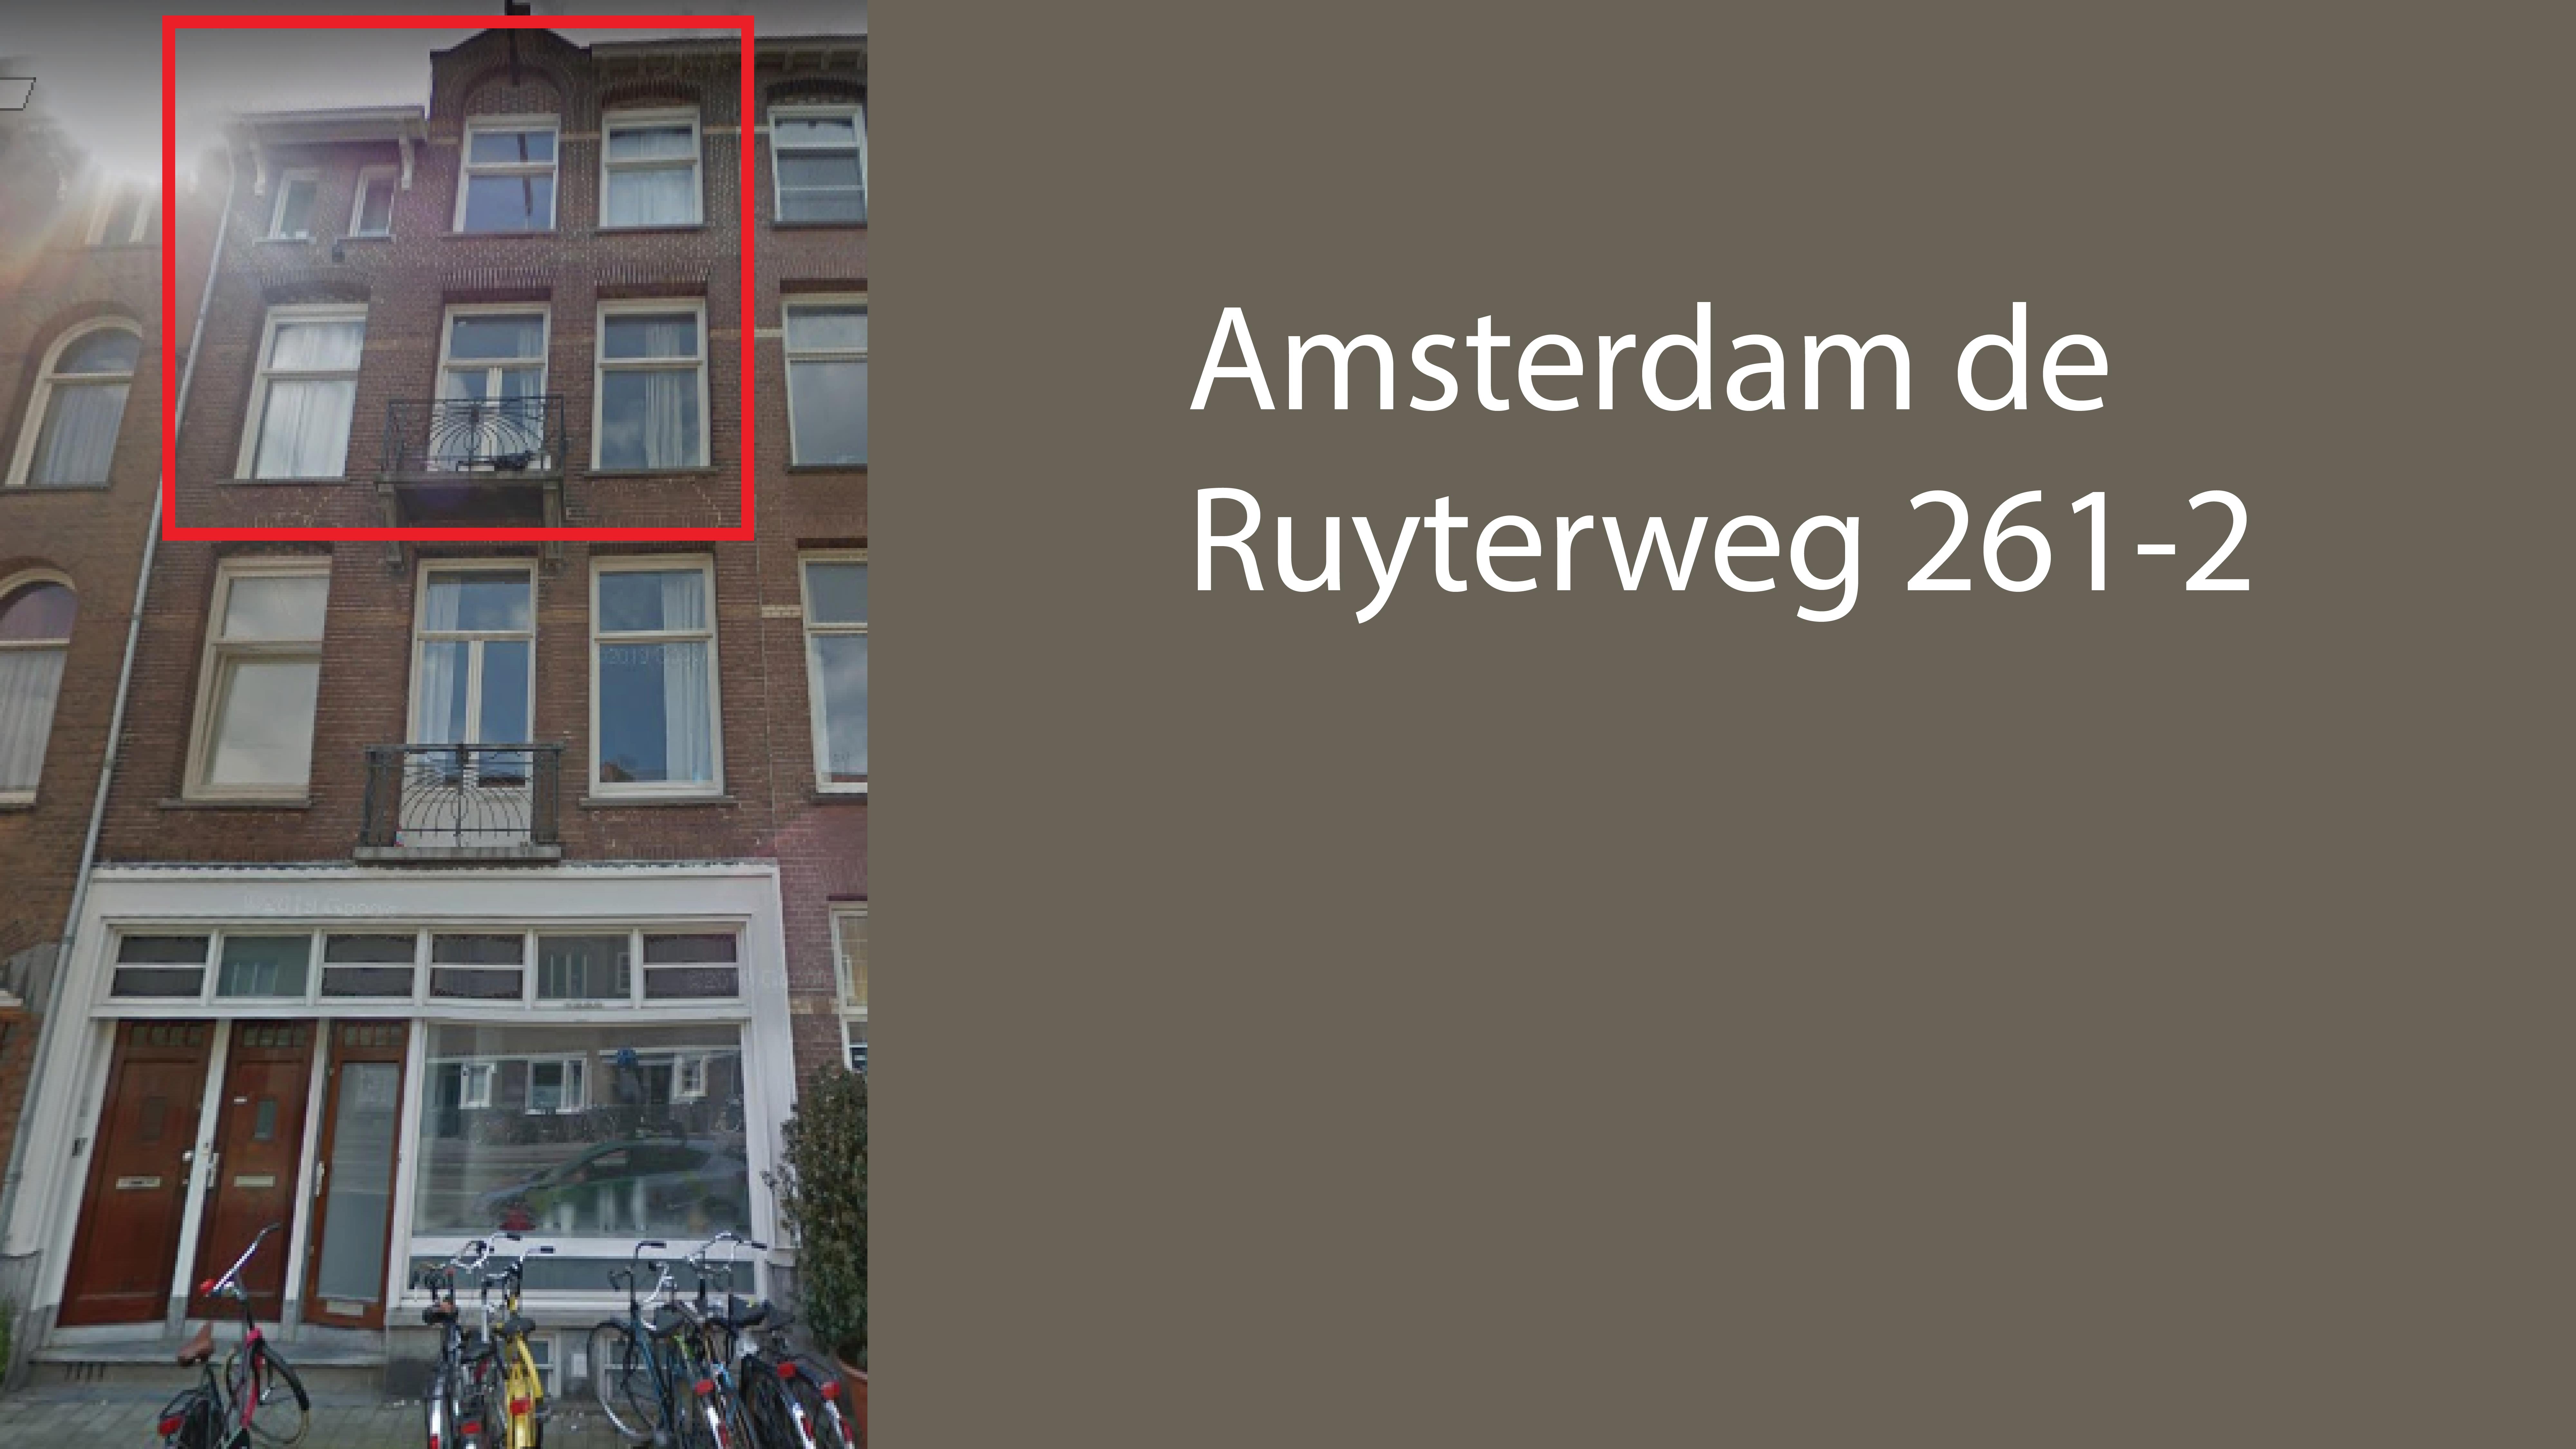 Amsterdam de Ruyterweg 261-2